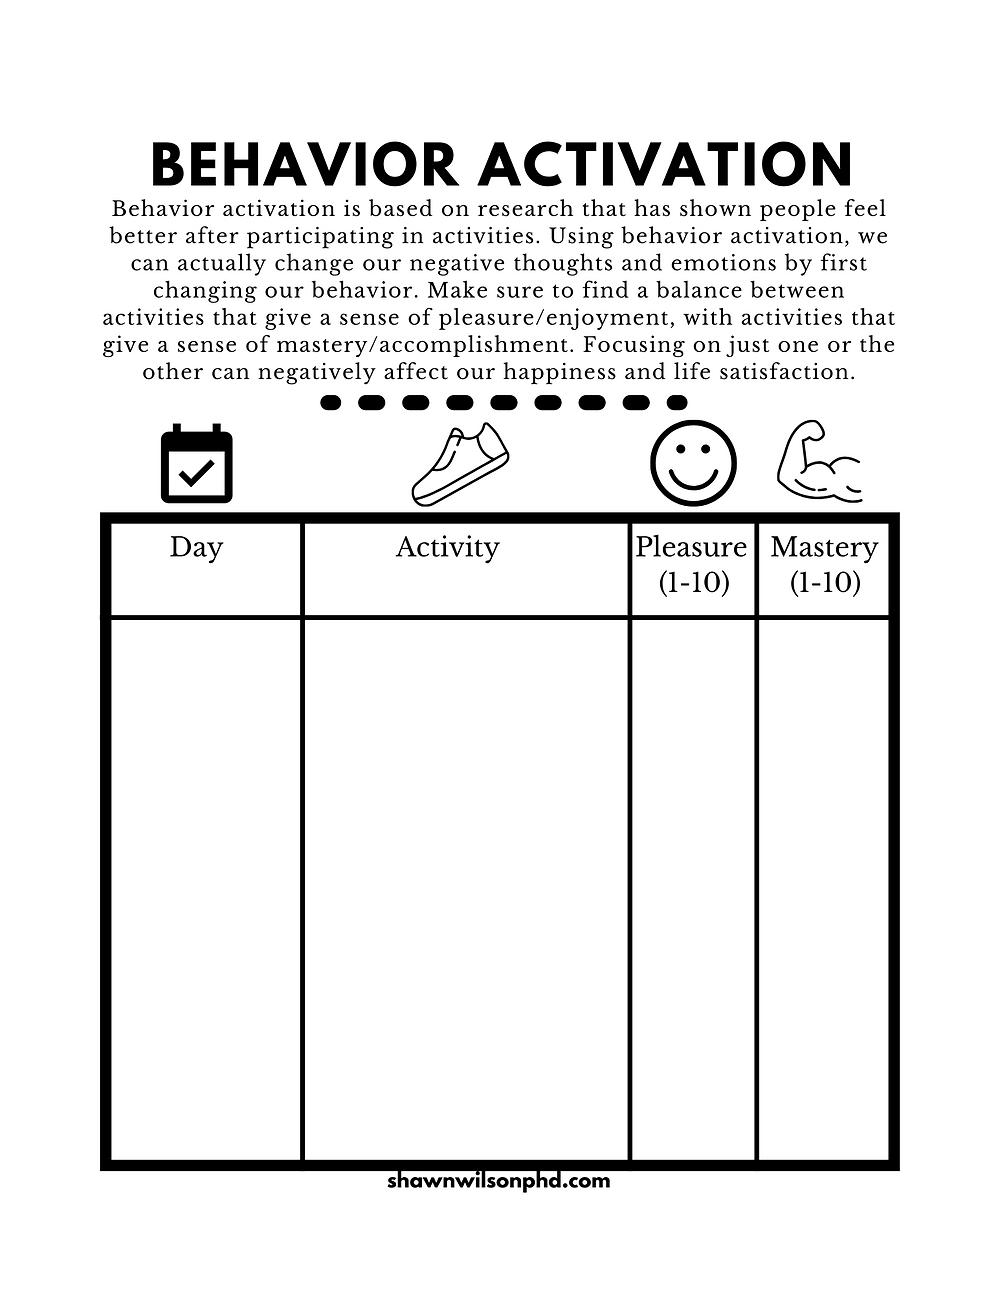 Behavior activation worksheet